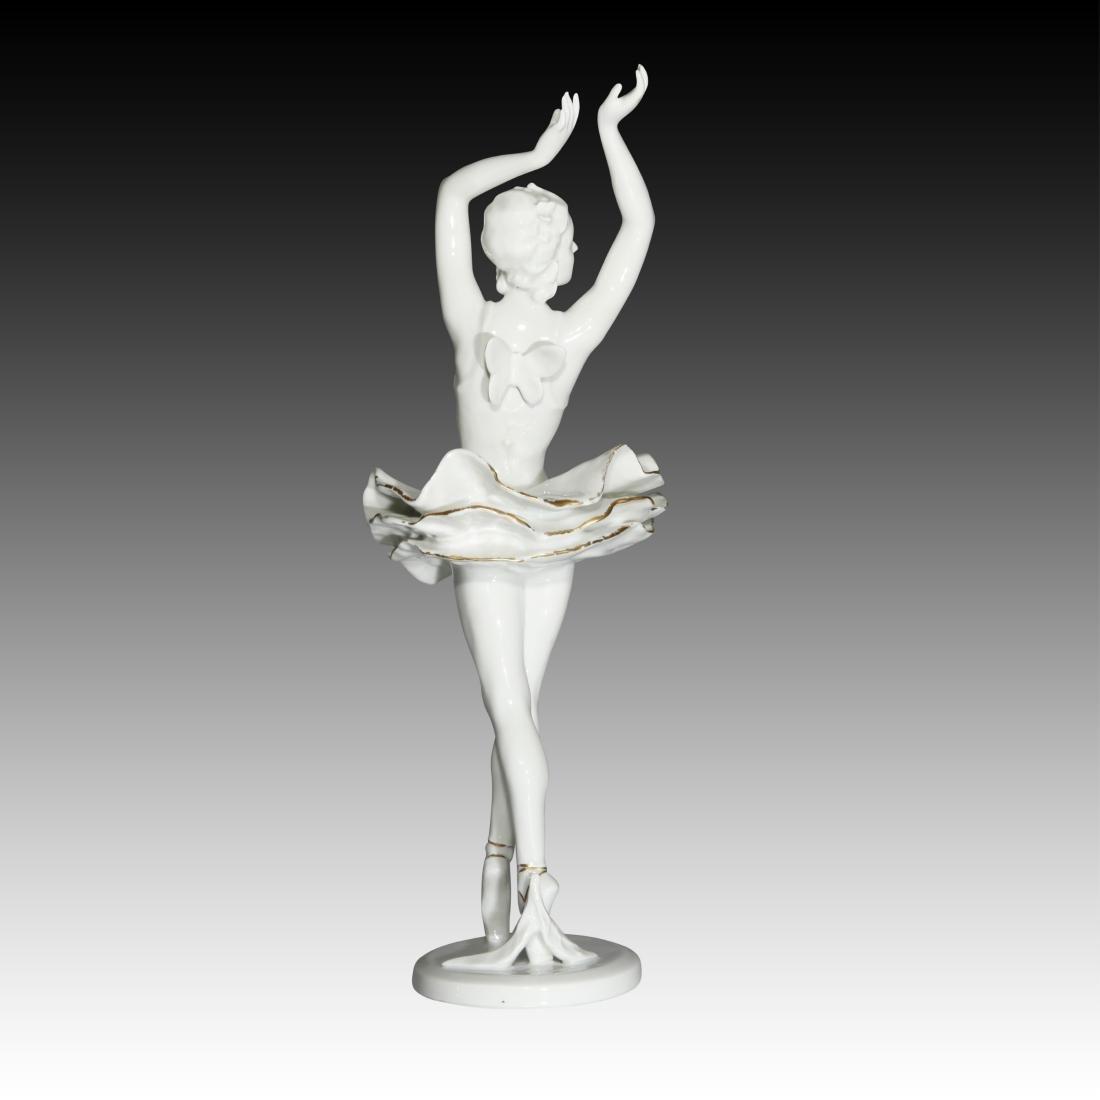 Rosenthal Female Ballerina Figurine - 3